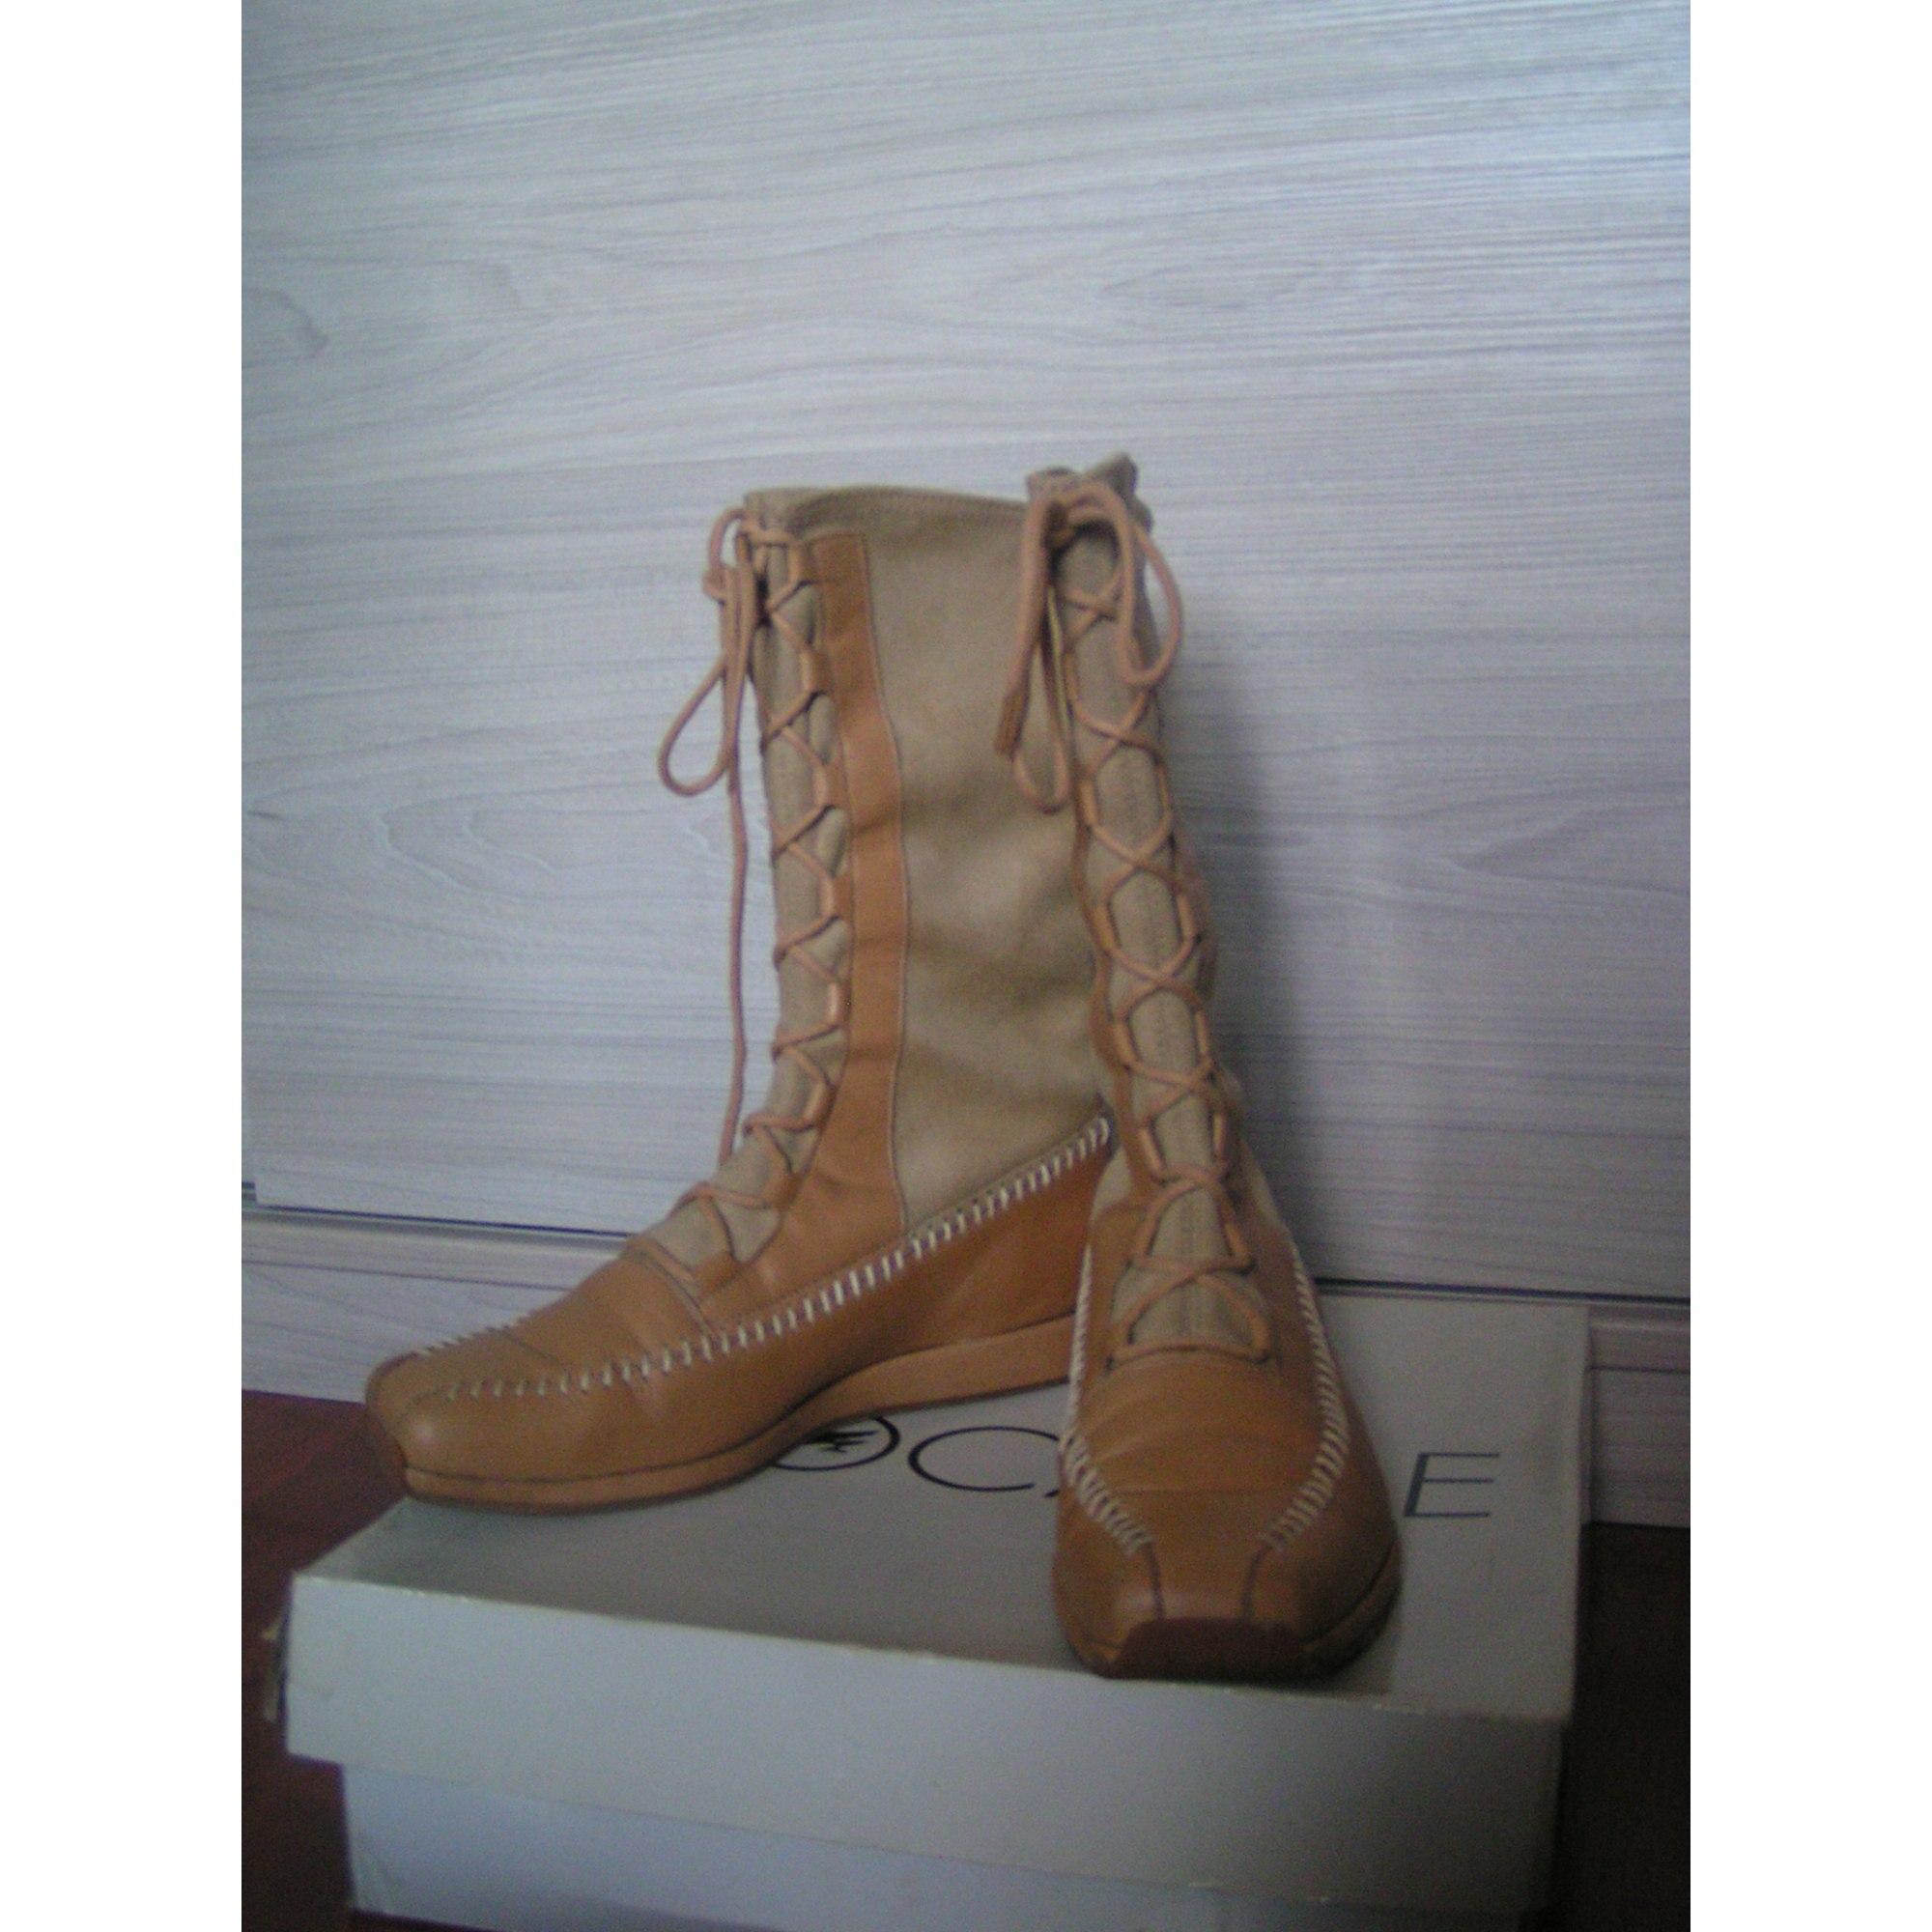 d3965ca6efb Bottines   low boots plates BOCAGE 37 beige - 6947330